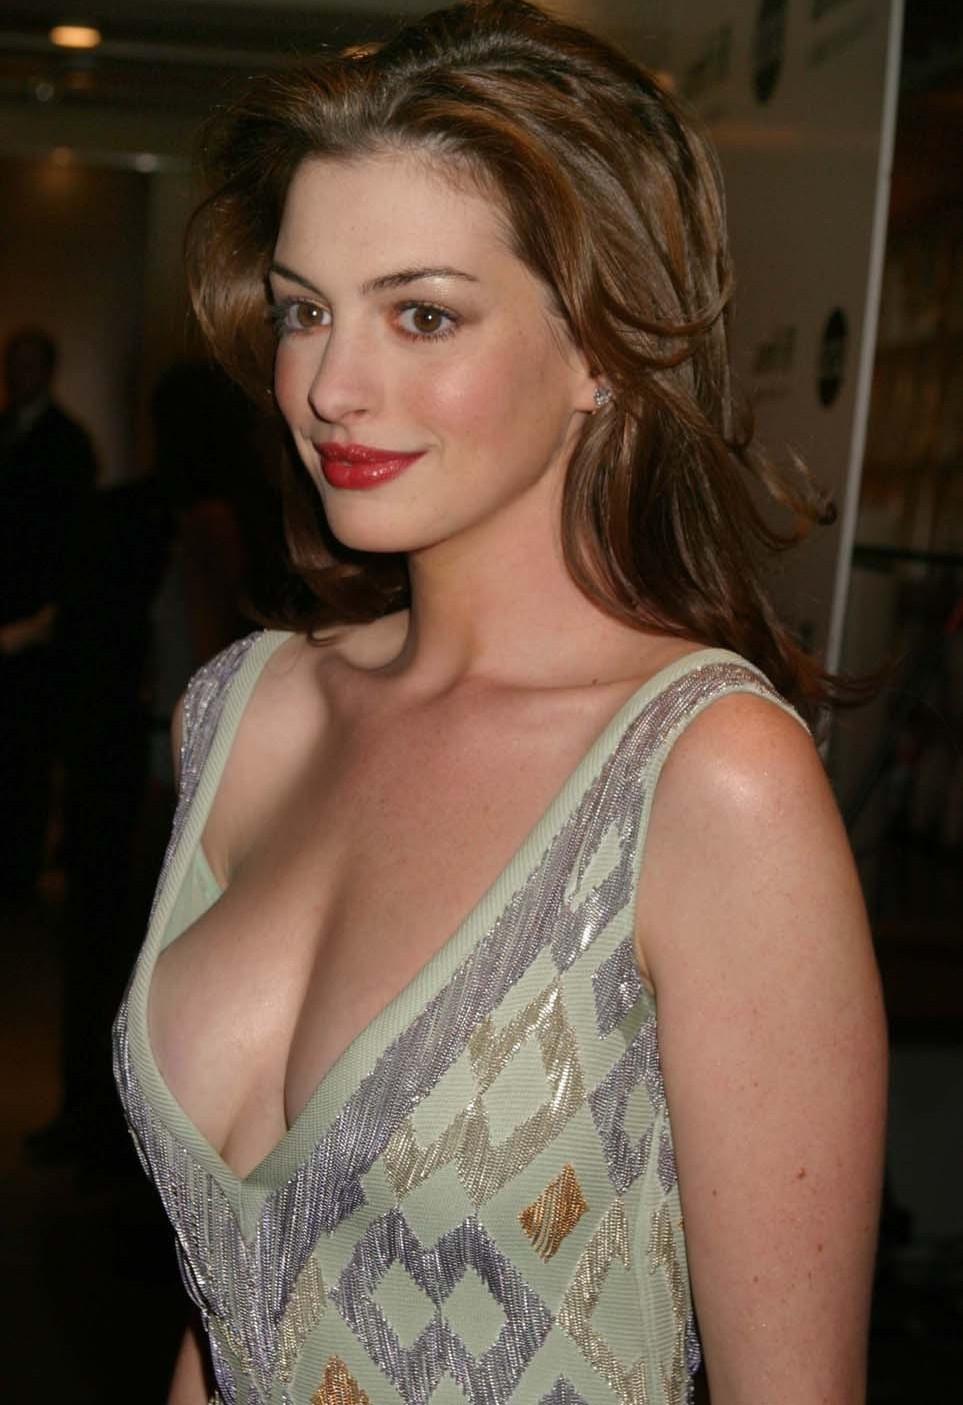 Big Tits Celebrities Pics